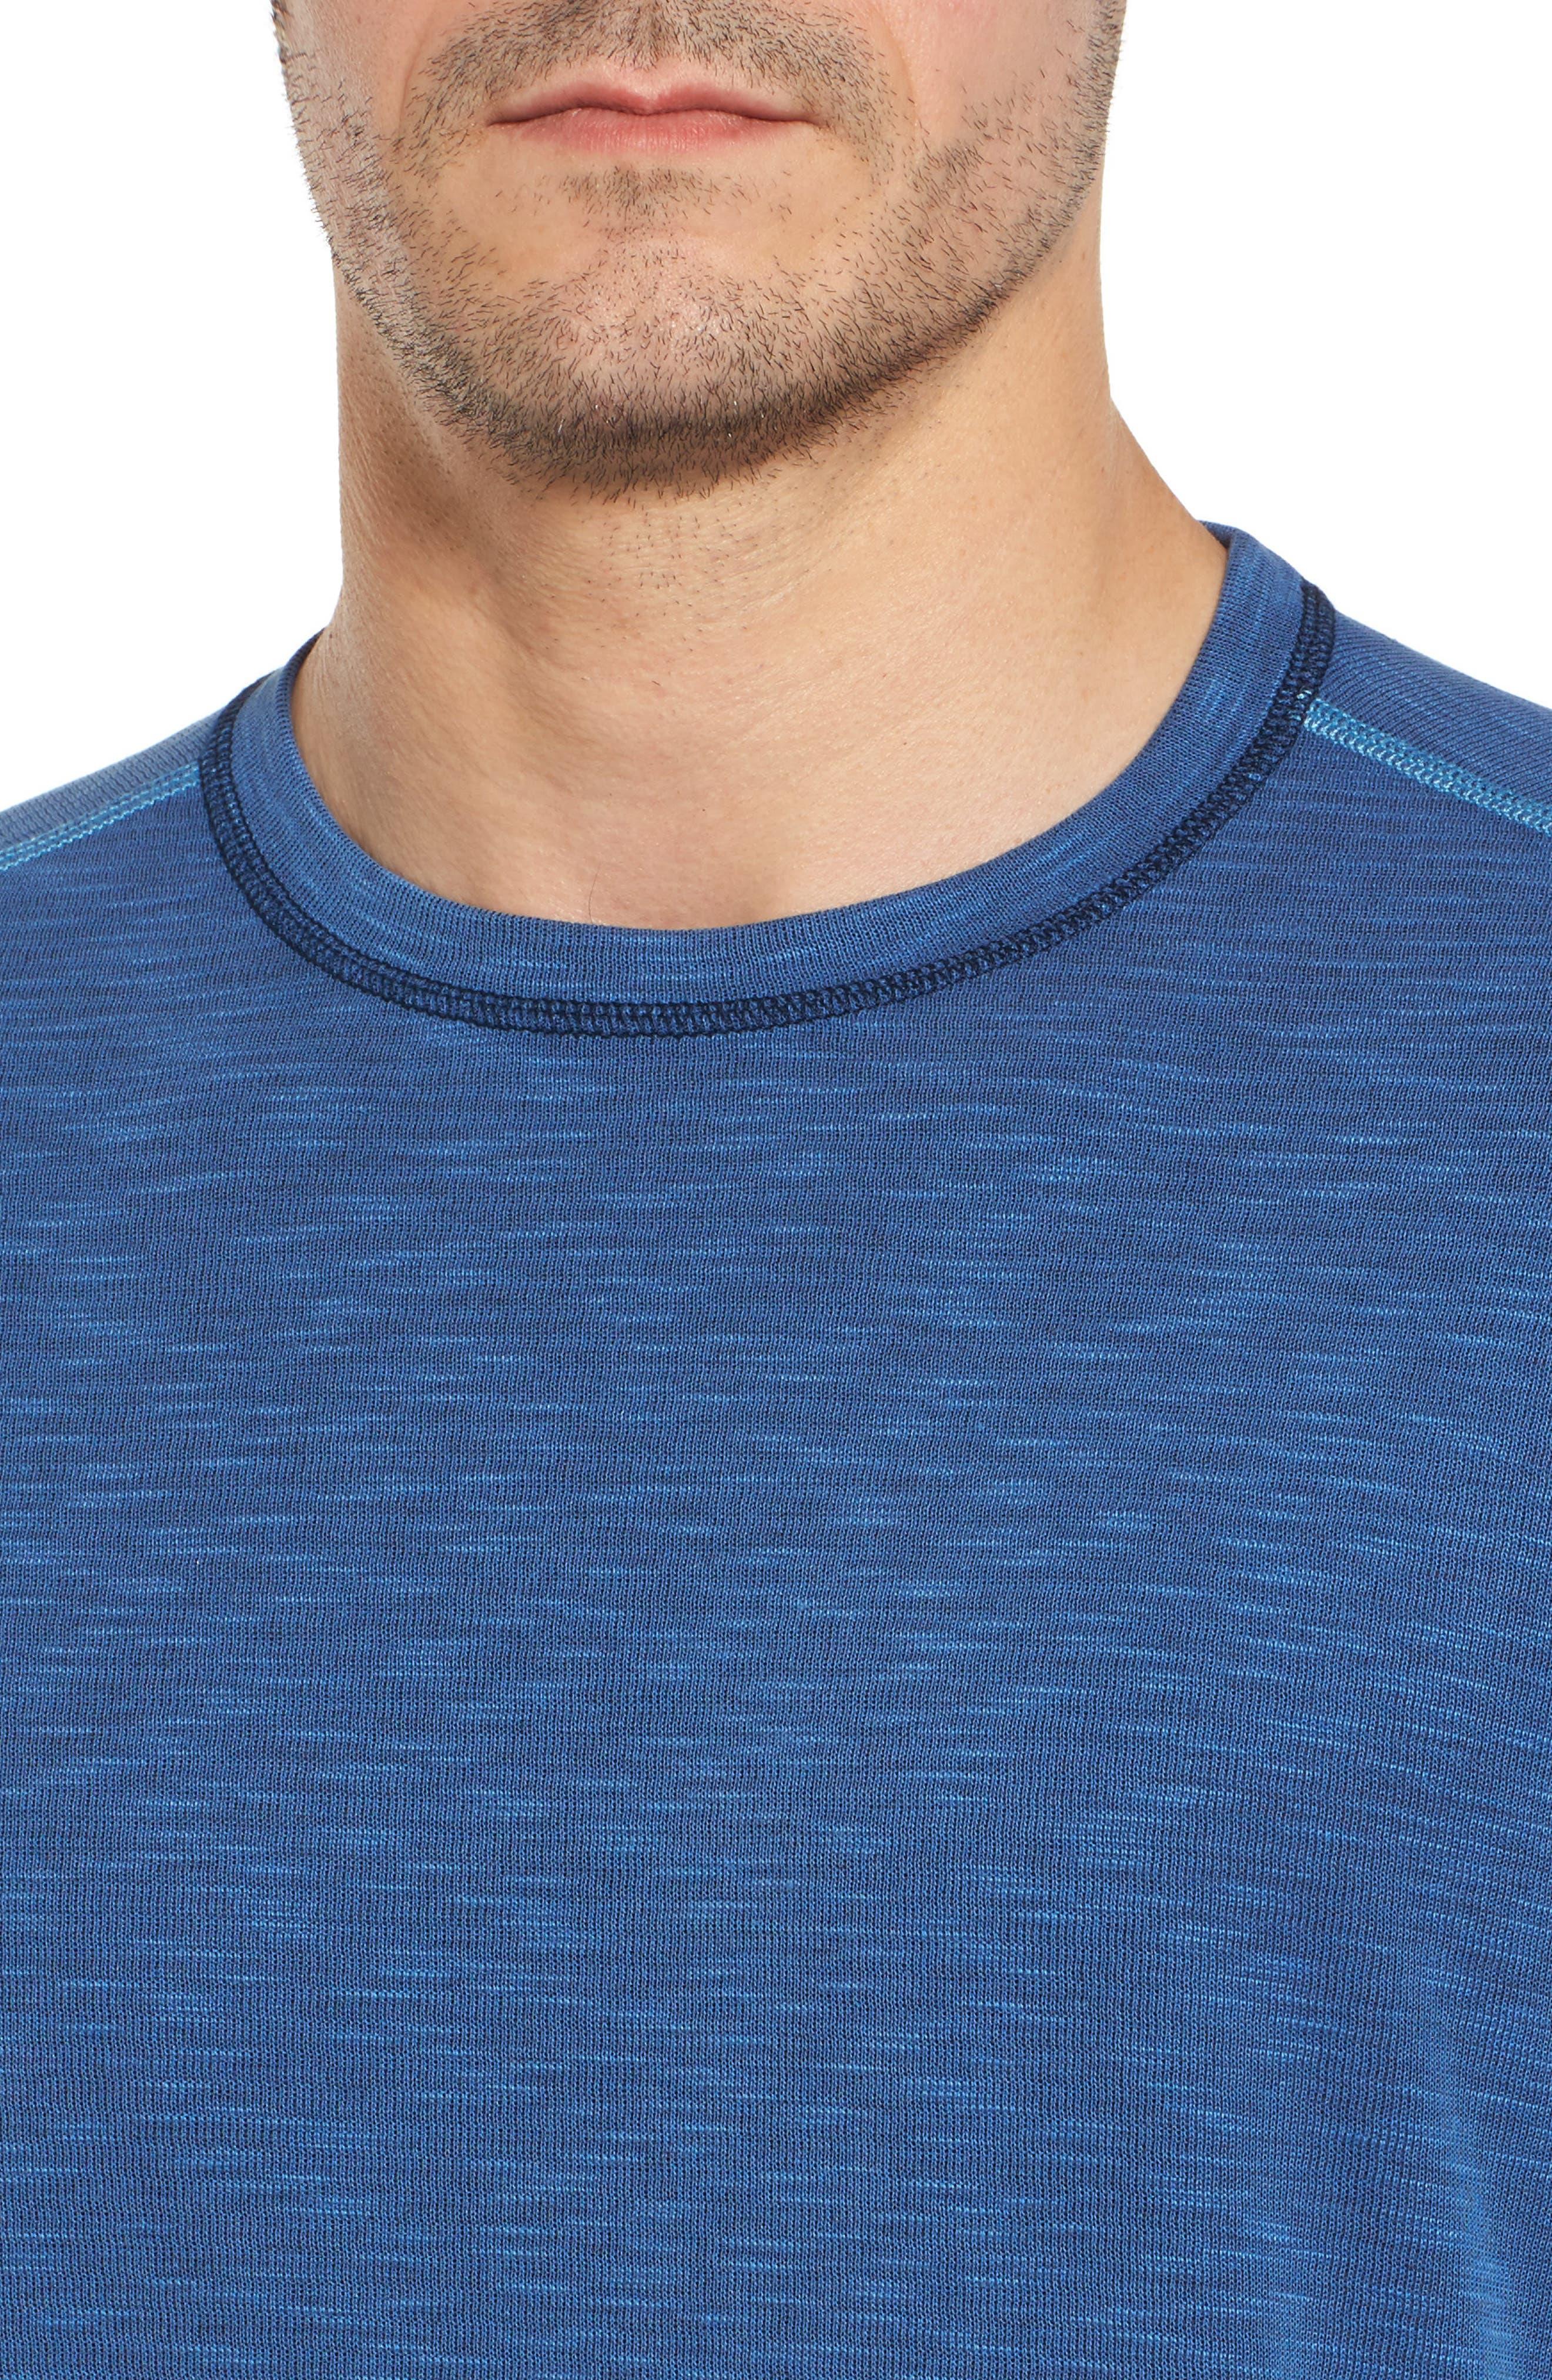 Flip Tide Standard Fit T-Shirt,                             Alternate thumbnail 5, color,                             GALAXY BLUE